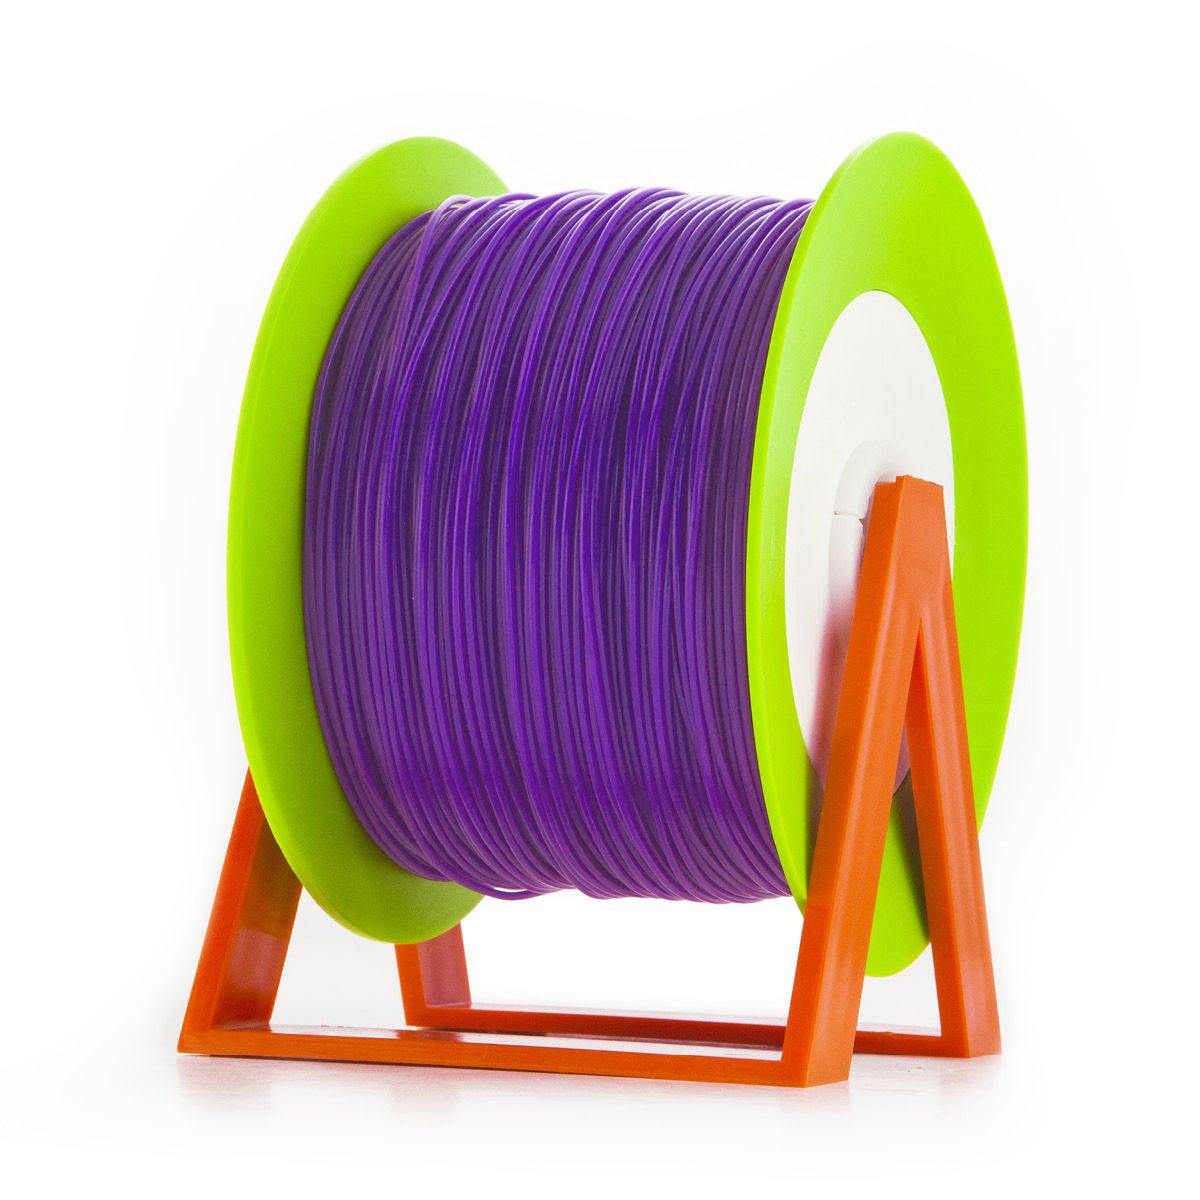 PLA Filament | Color: Dark Violet